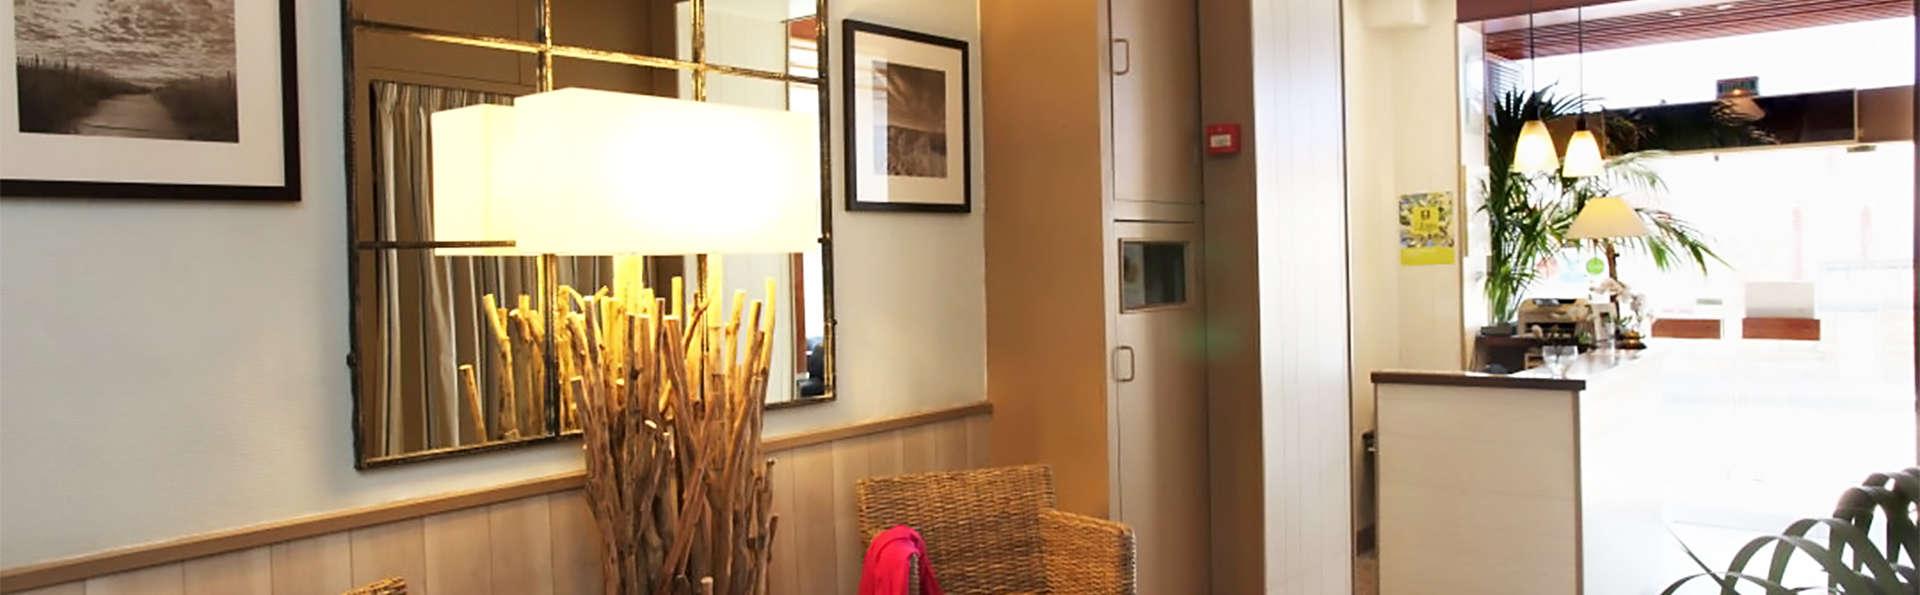 Hôtel des Druides - EDIT_lobby1.jpg